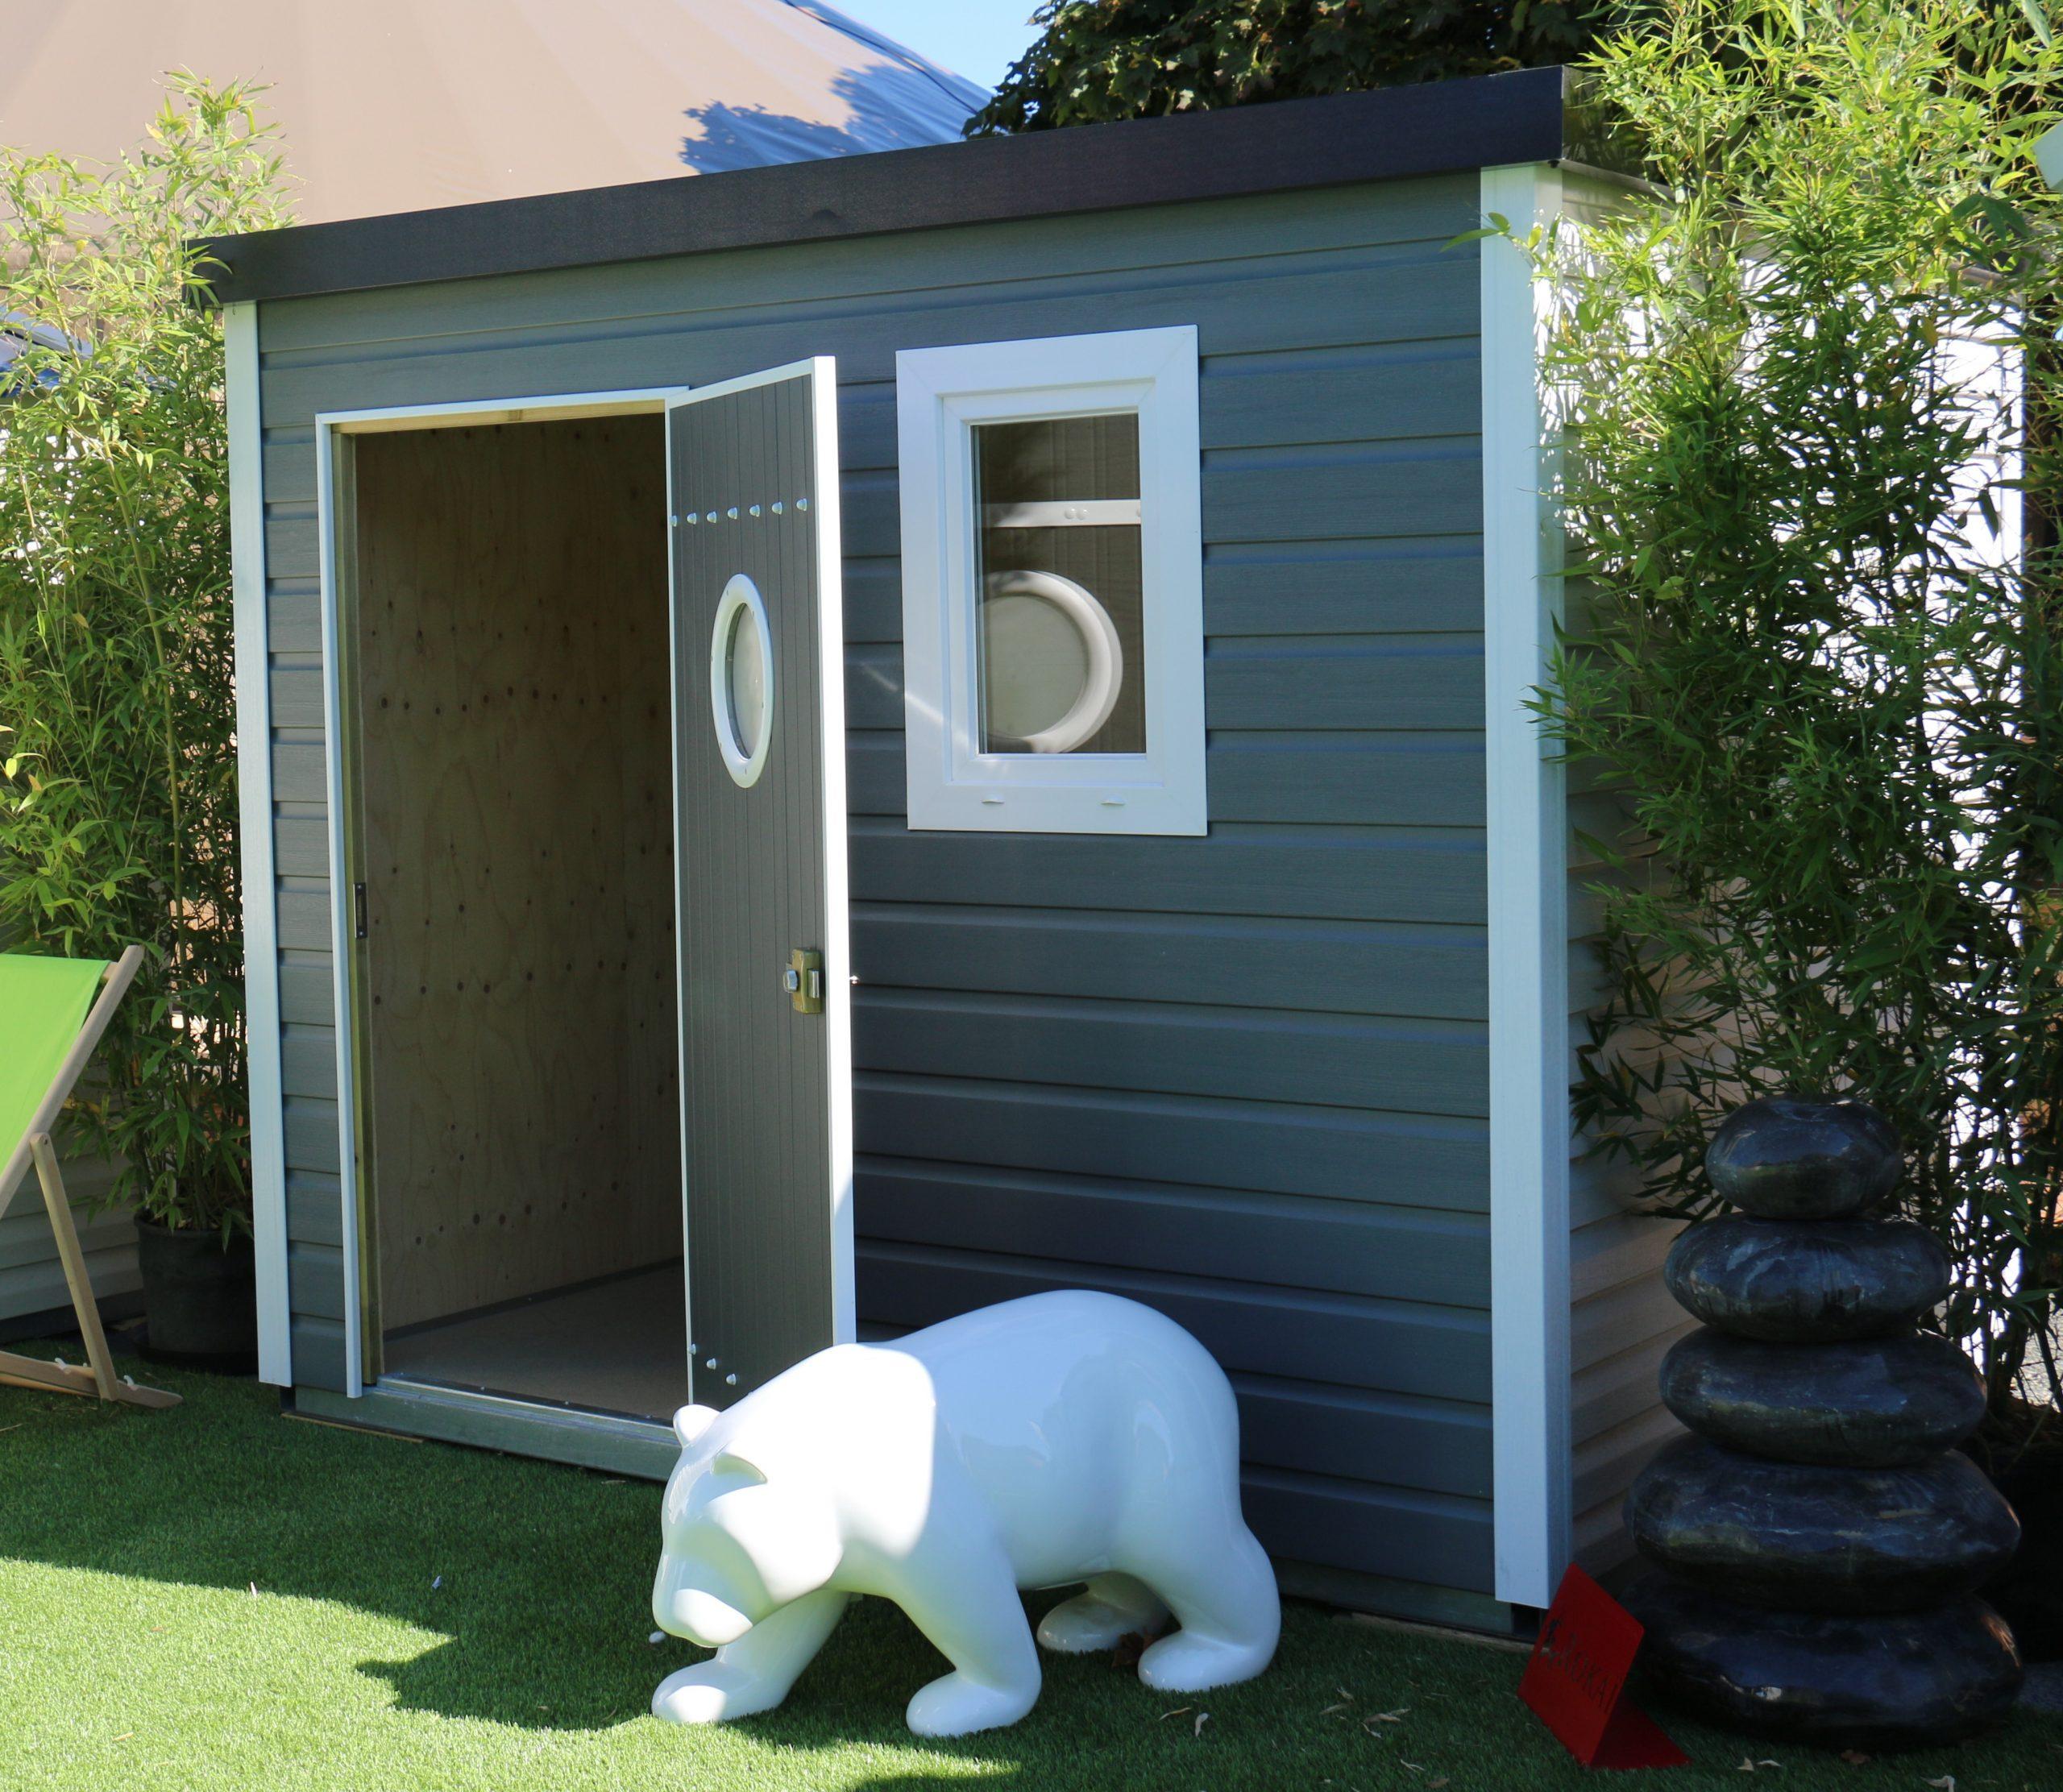 Abri De Jardin Design Toit Plat 5 M² - Abri Pvc < 10 M² Nea ... à Abri De Jardin Pvc Toit Plat